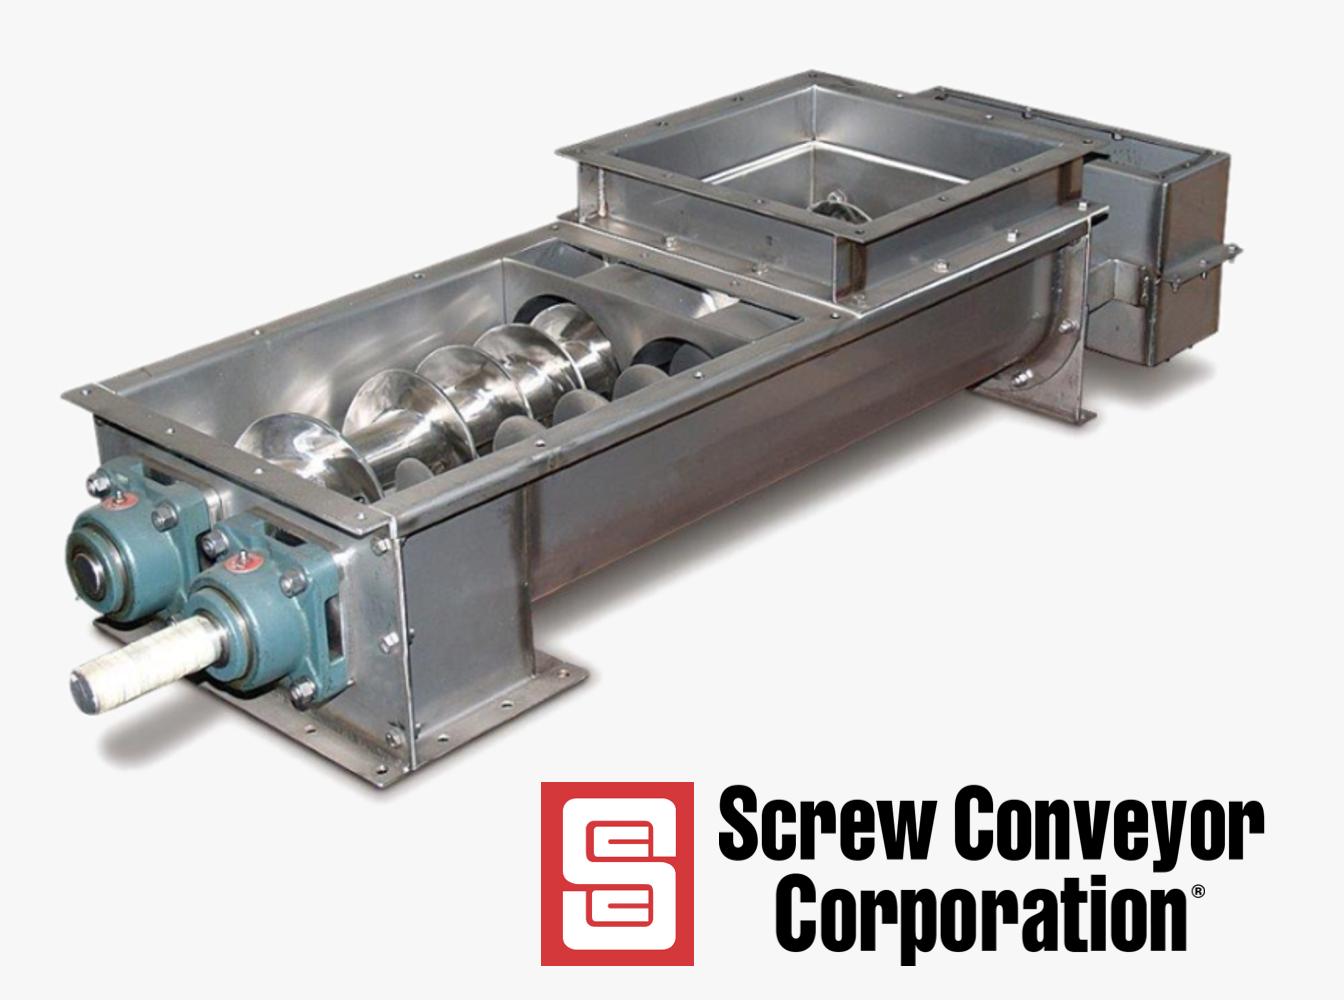 screw-conveyor-corporation-product.png